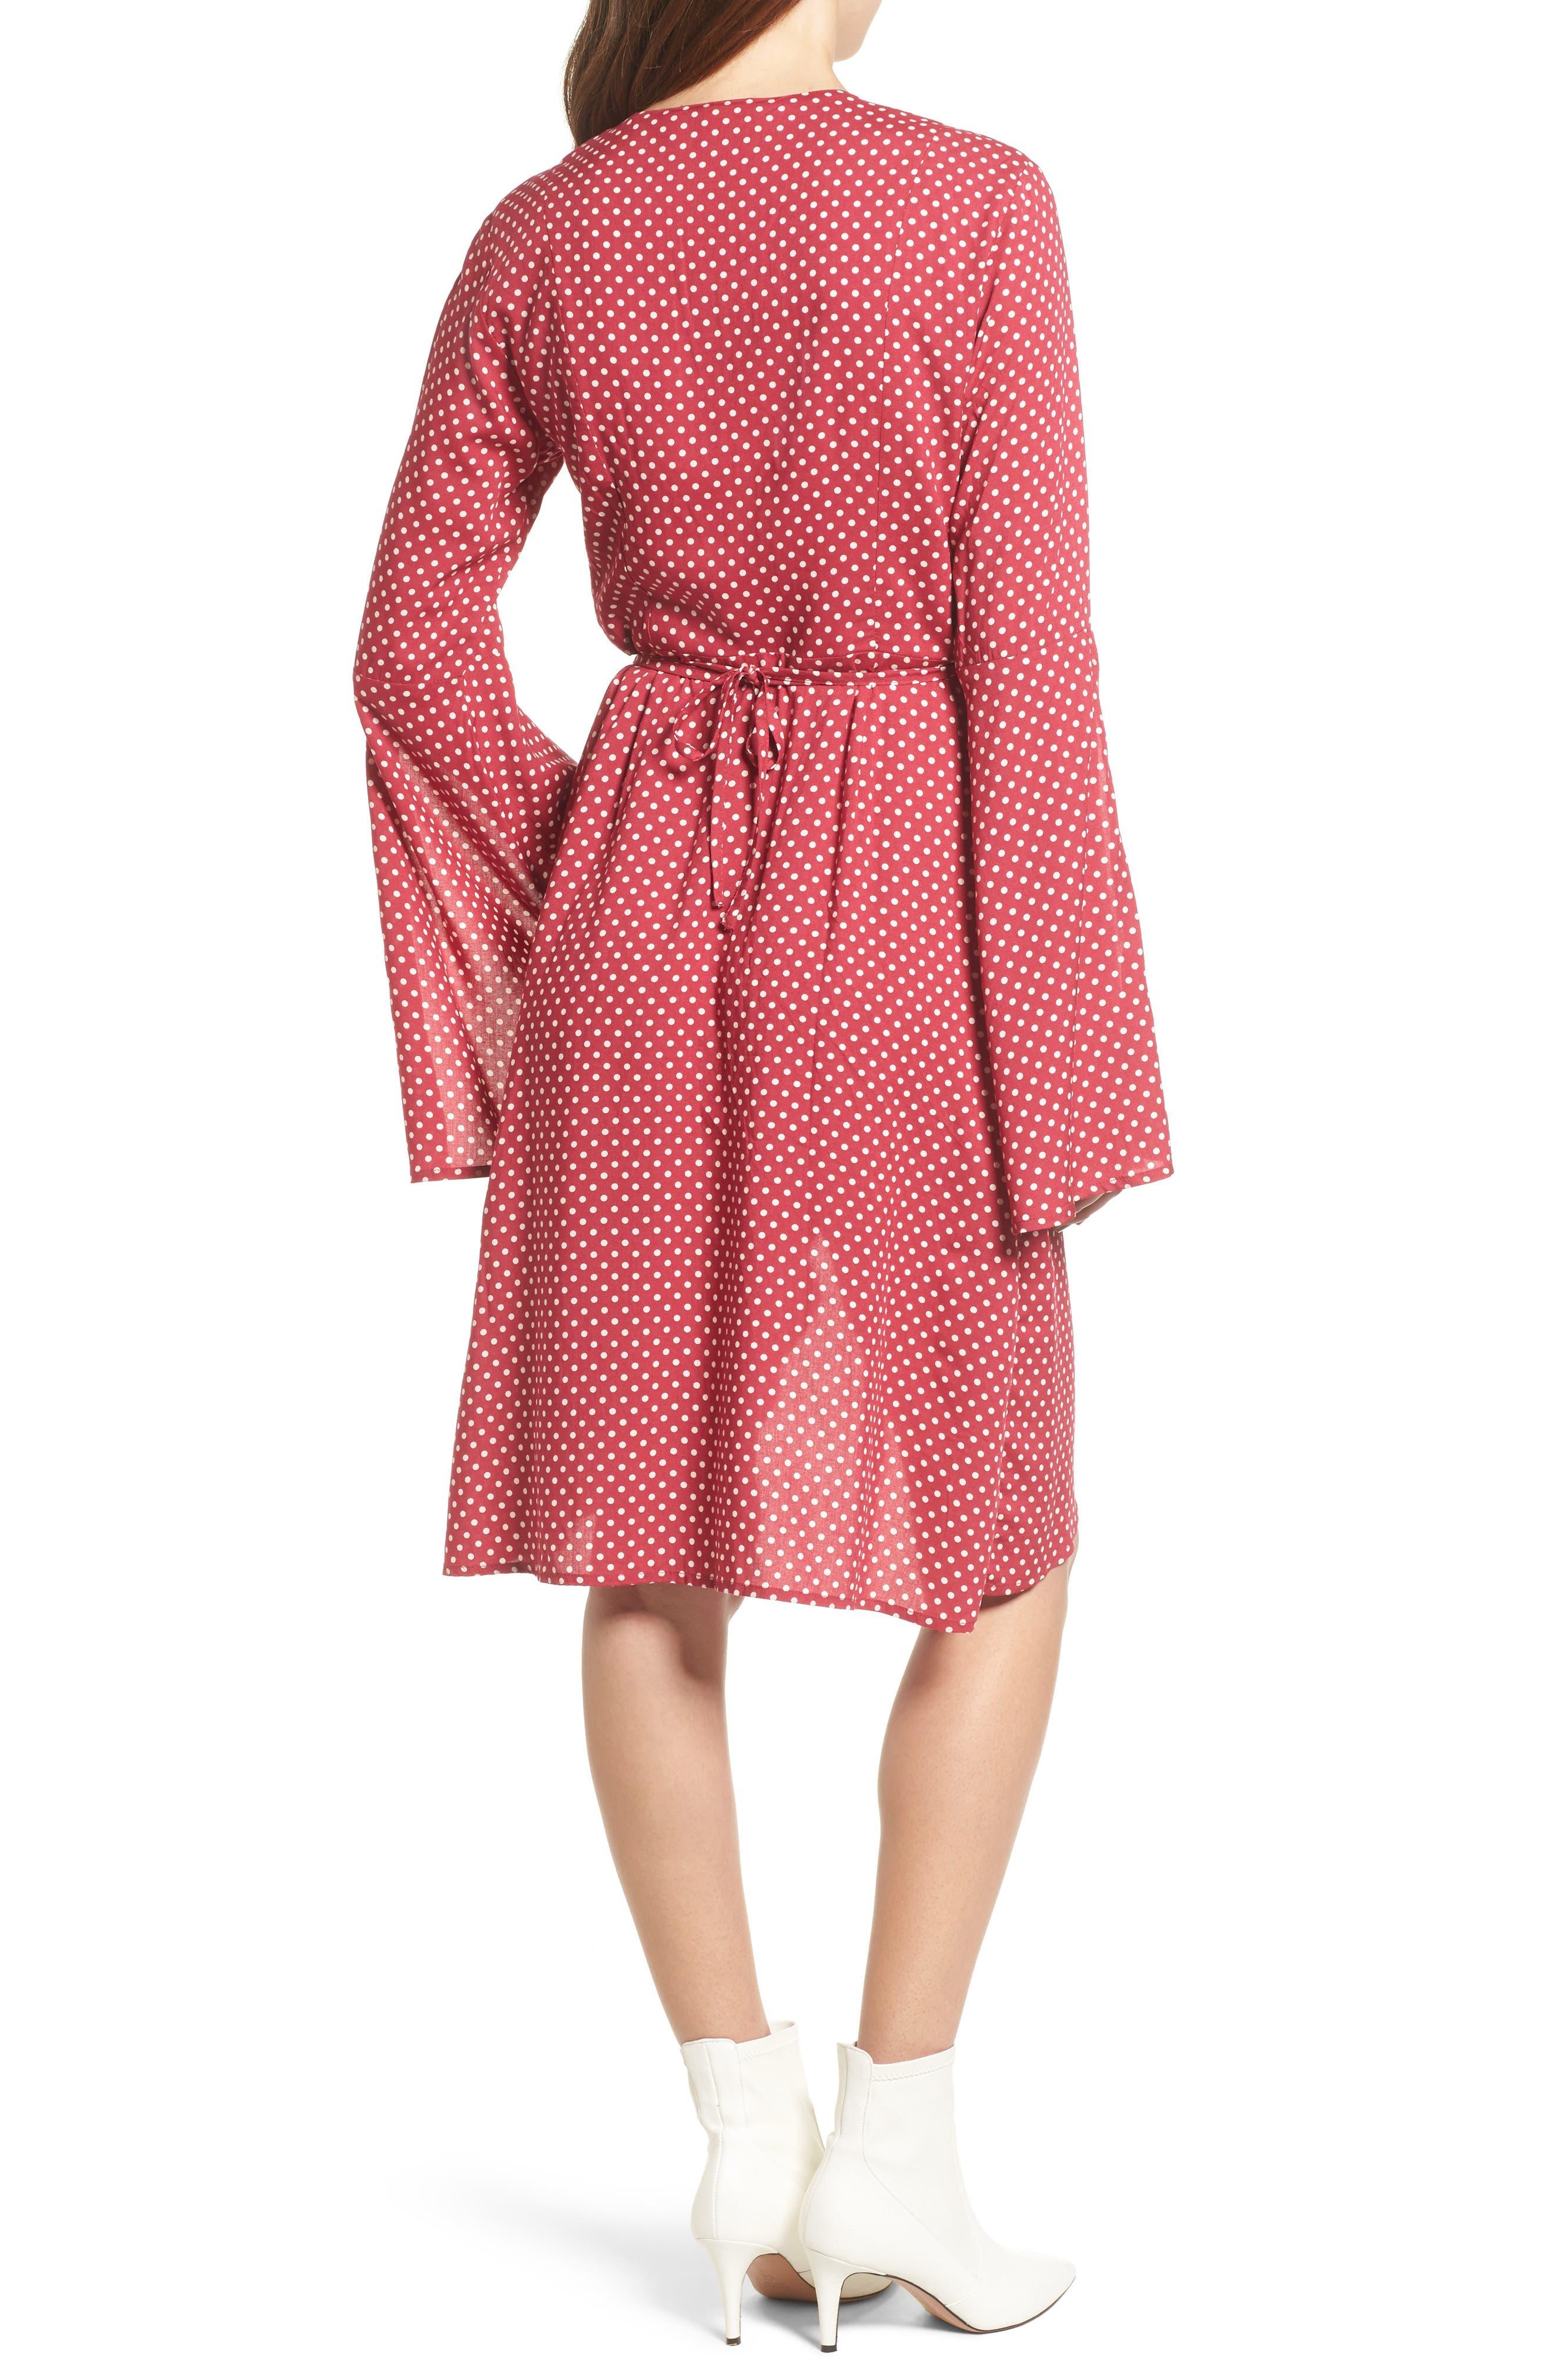 Fearless Polka Dot Wrap Dress,                             Alternate thumbnail 3, color,                             Multi Red